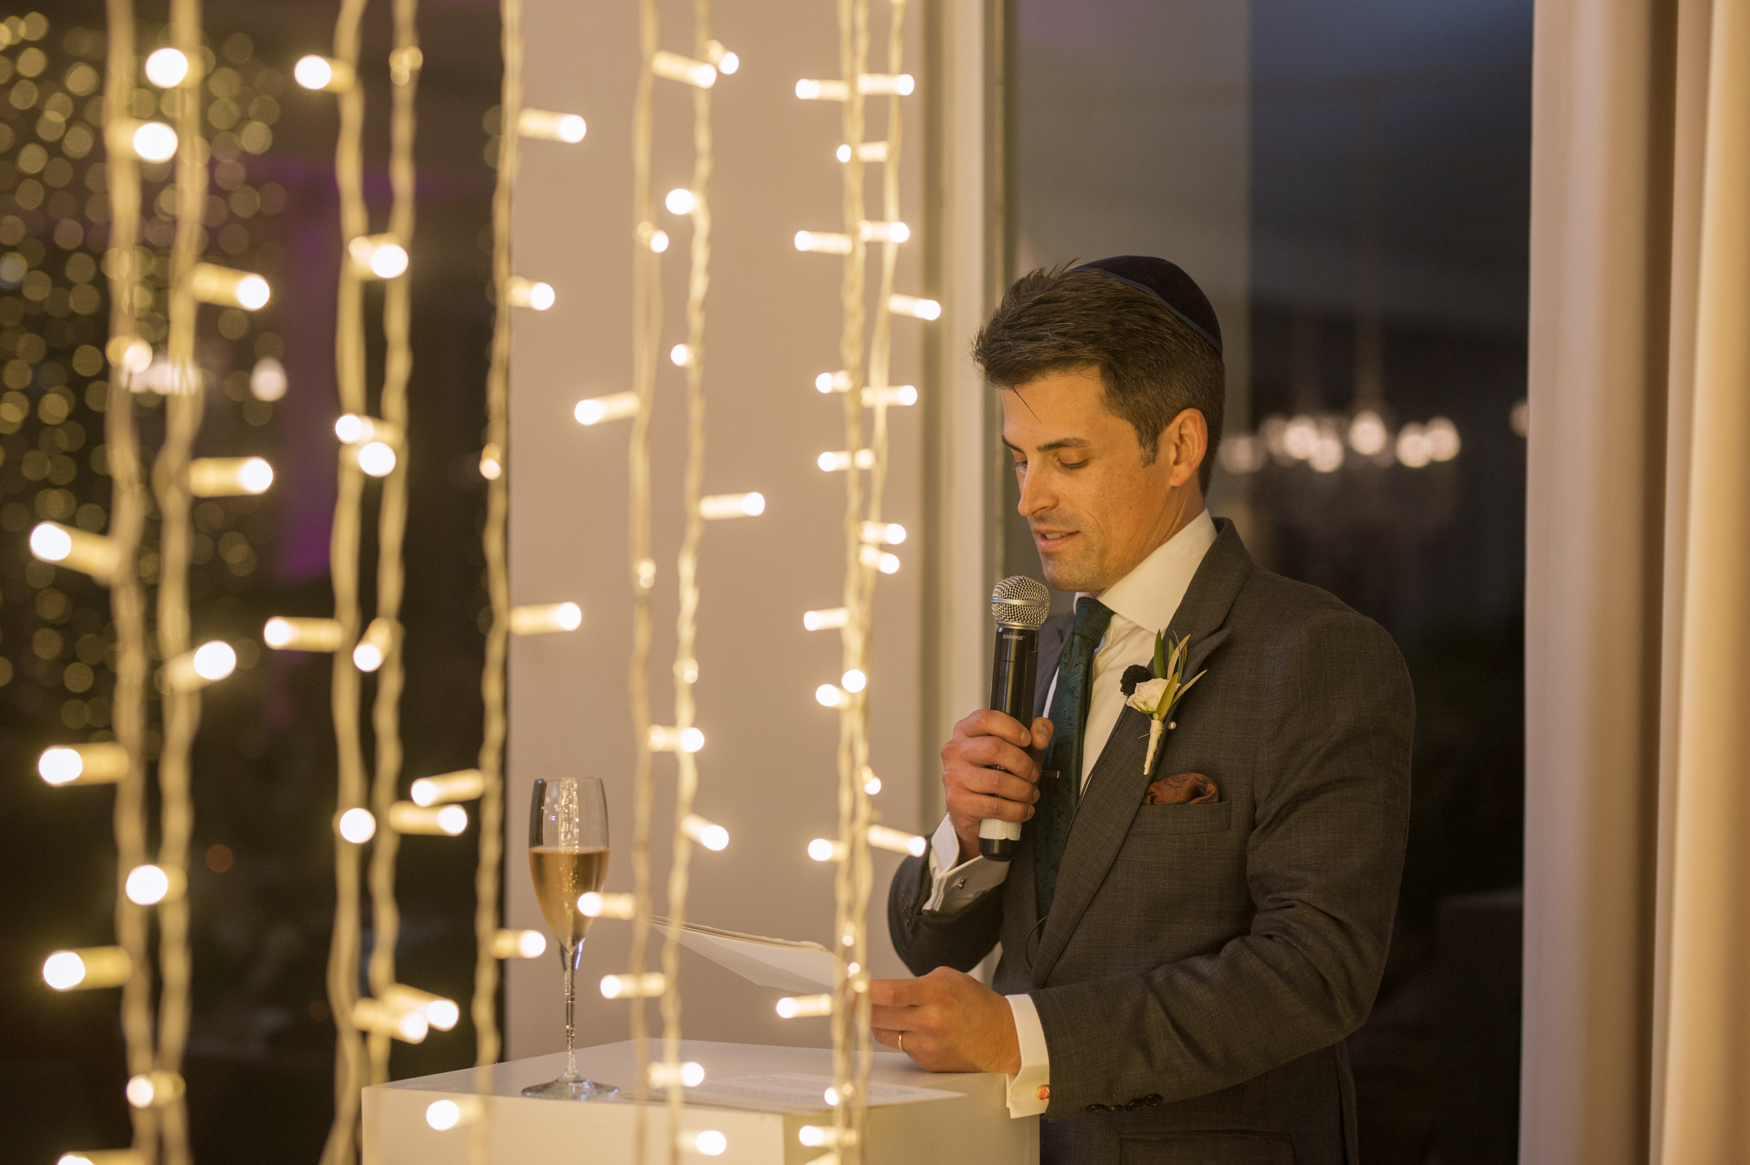 Leon_&_Martine's_Wedding_Photographs_17th_April_2019_@johnhenryweddingphoto_Low_Resolution_Web-545.JPG